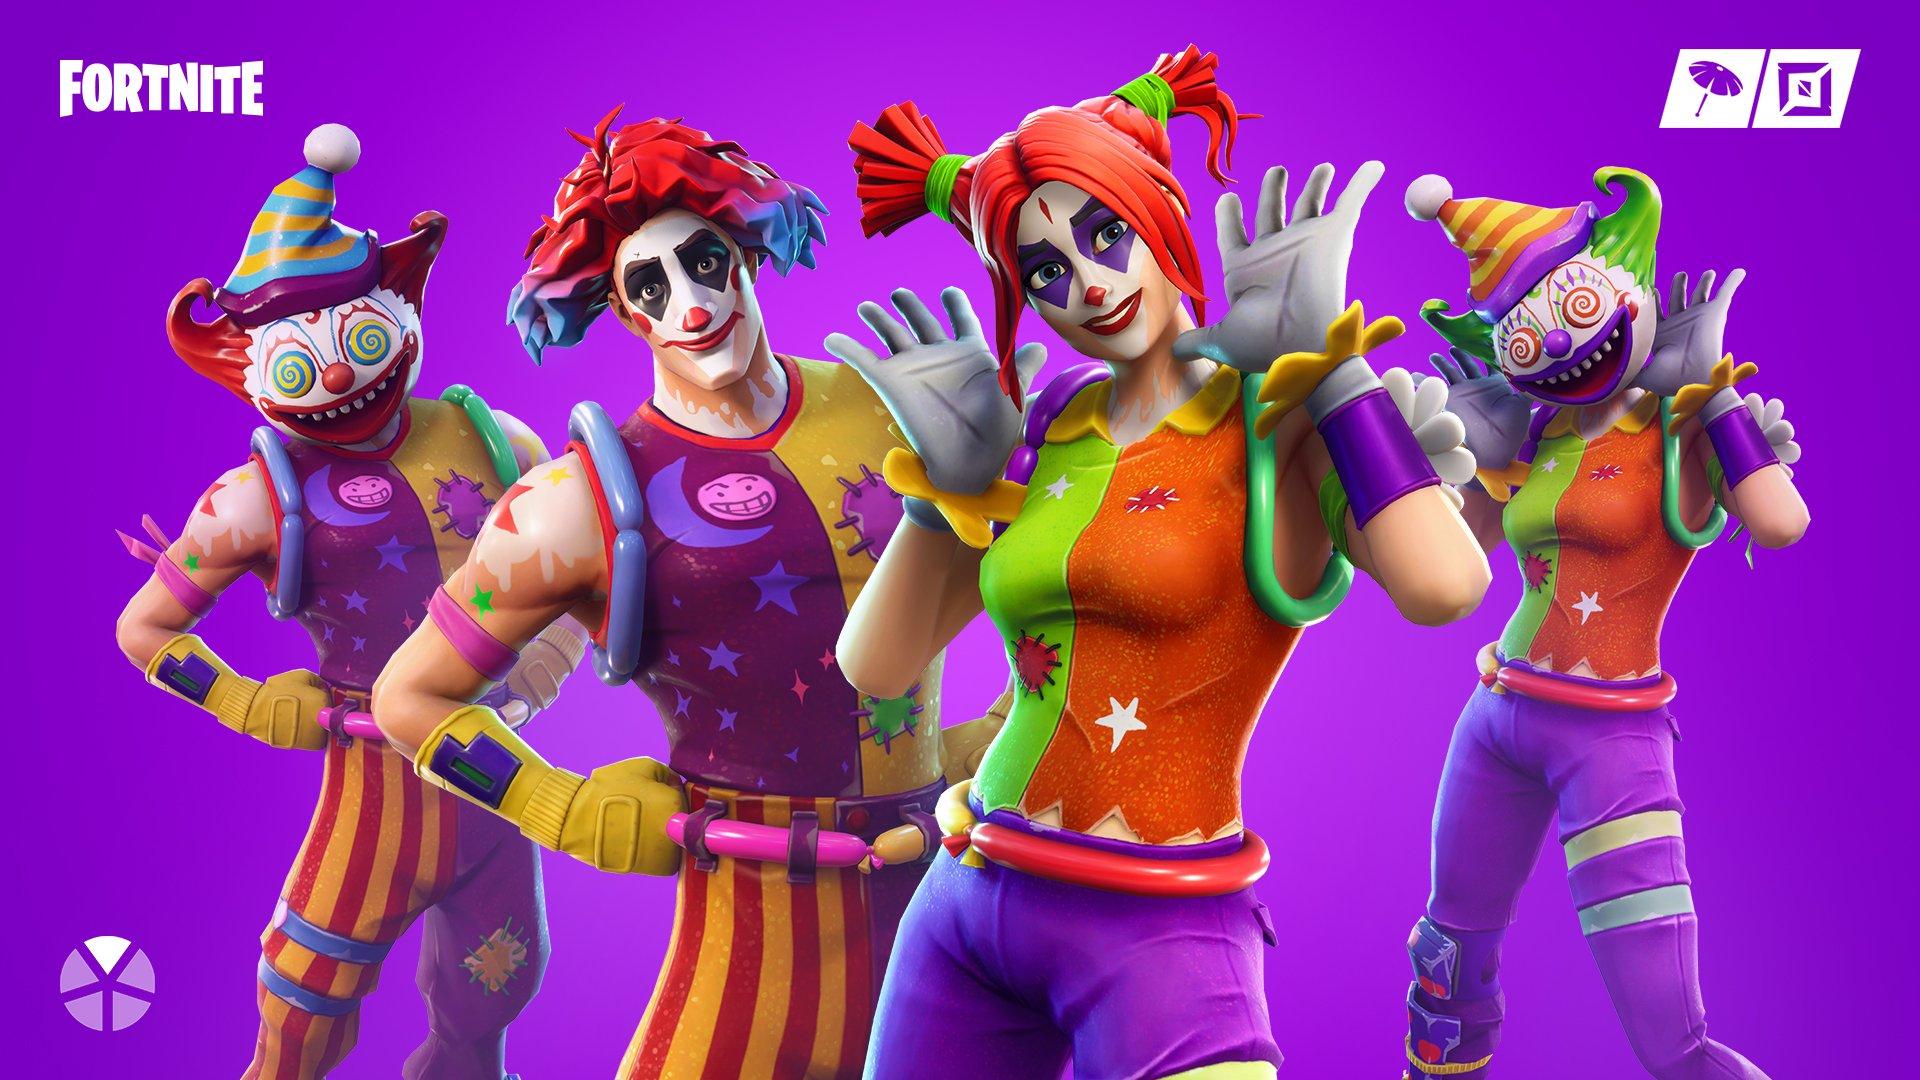 Nightmare-Fuel Peekaboo et Nite Nite Outfits reviennent au Fortnite Item Shop 1